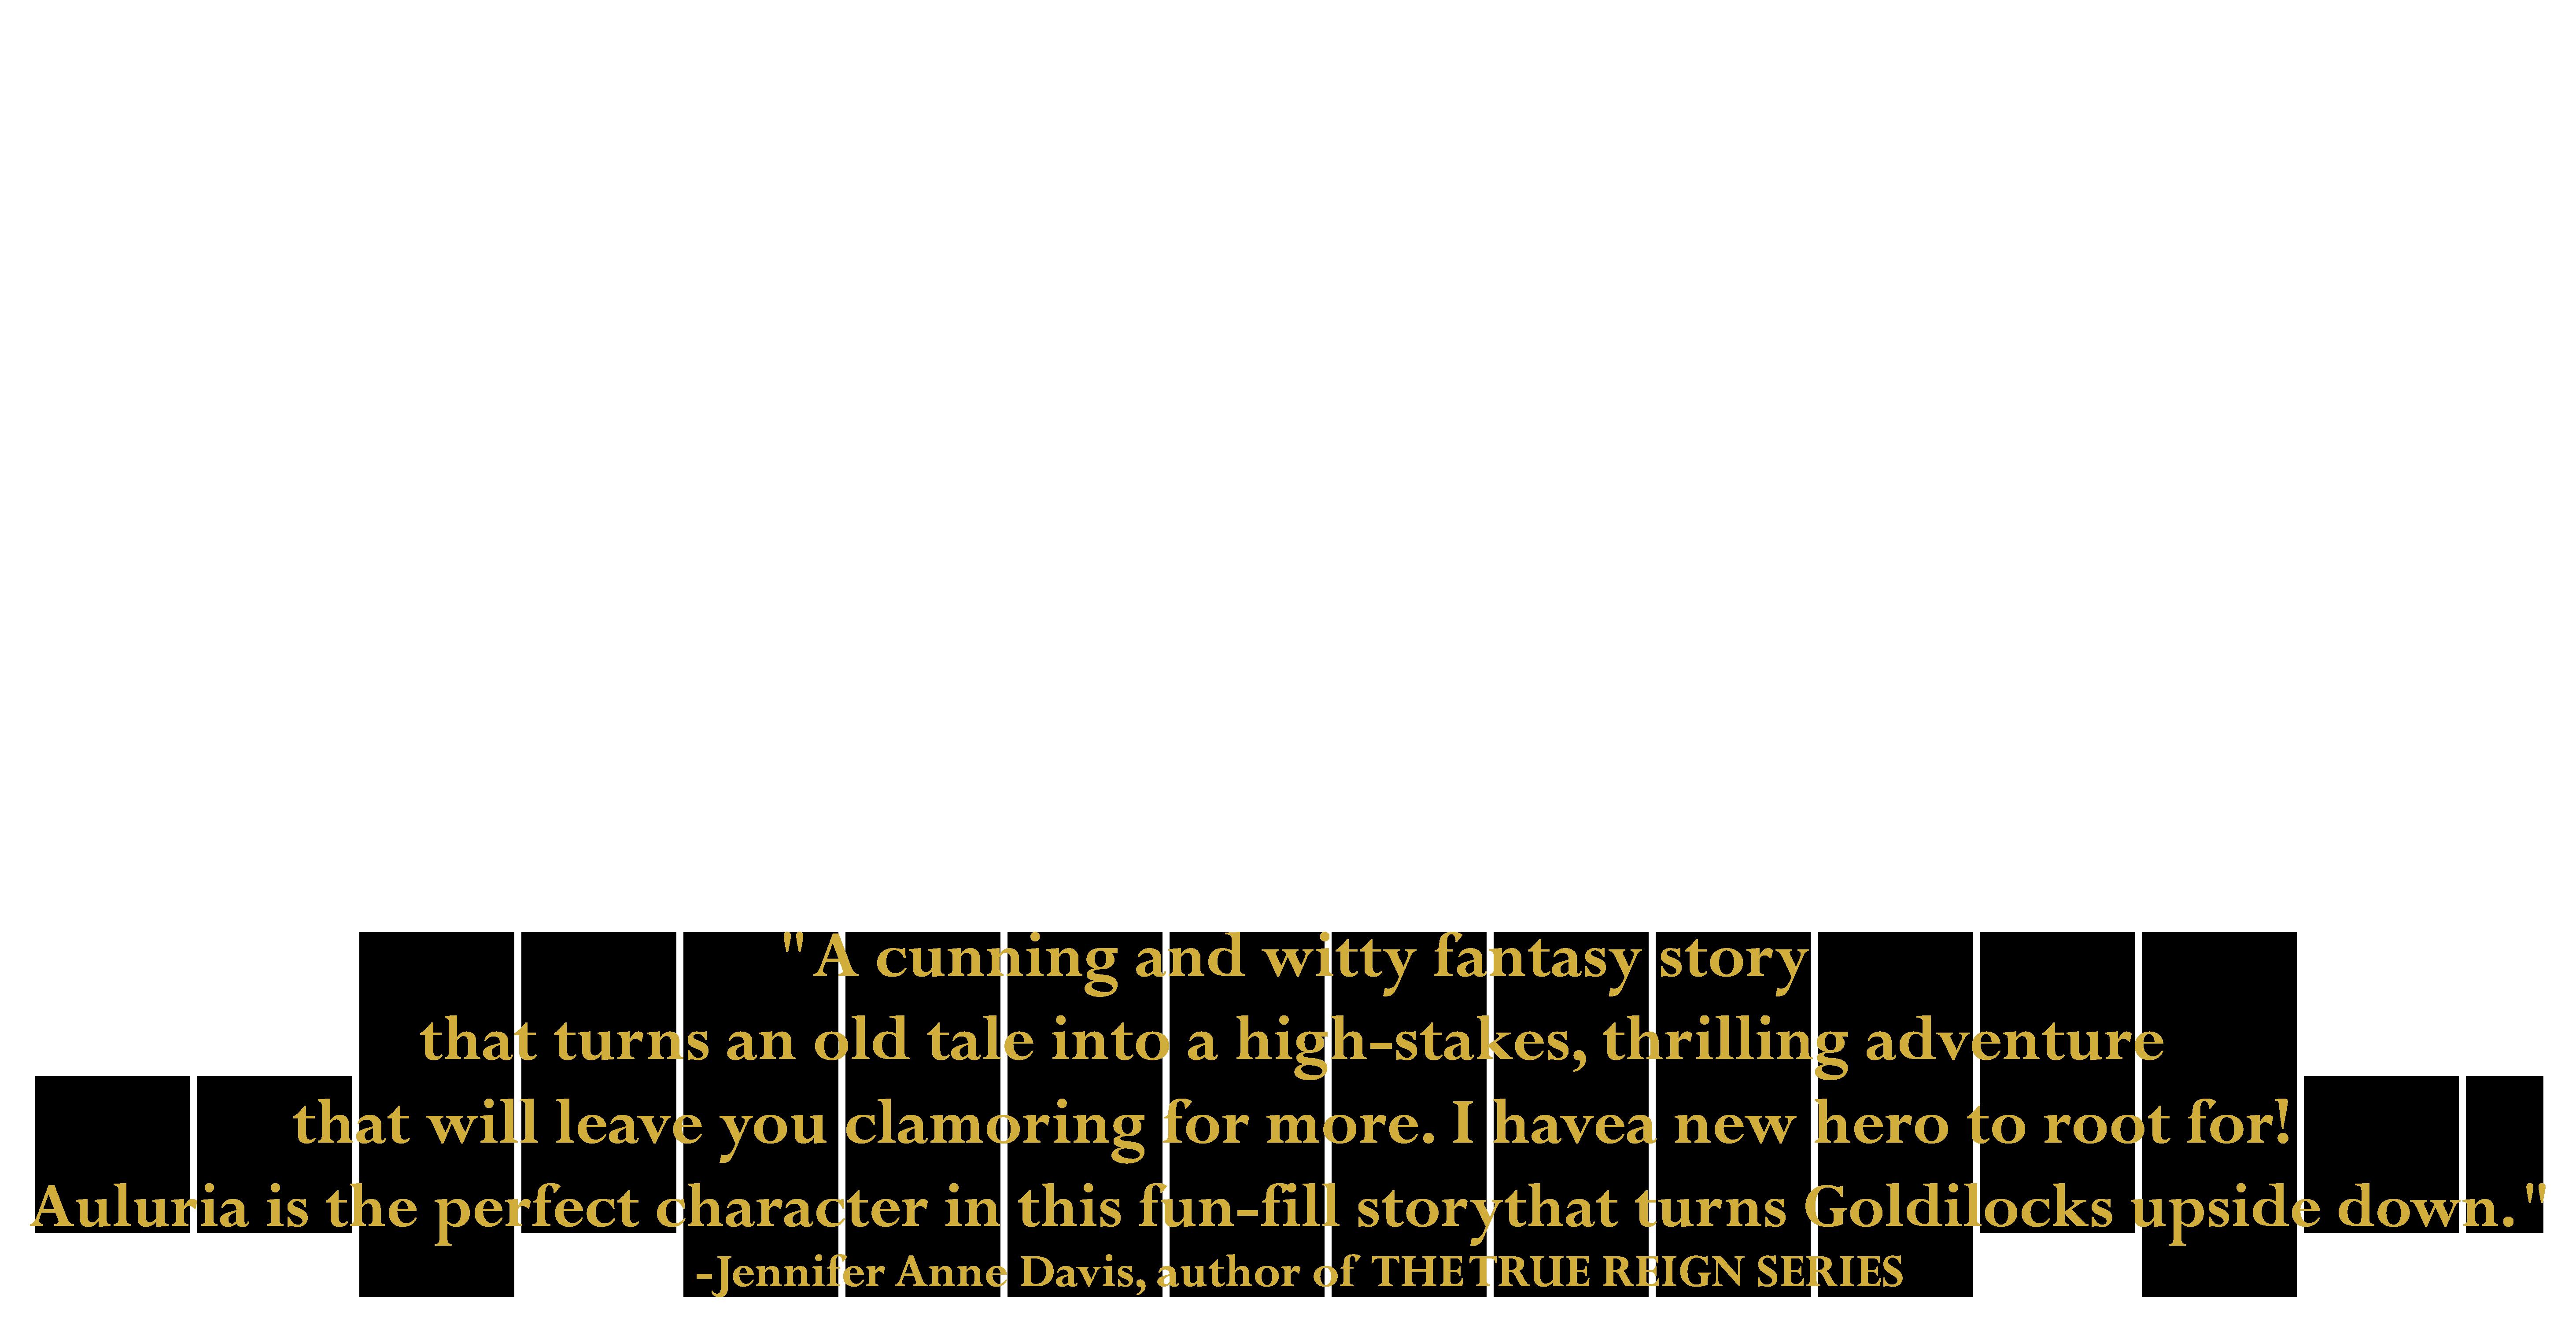 golden quote for website-jennifer